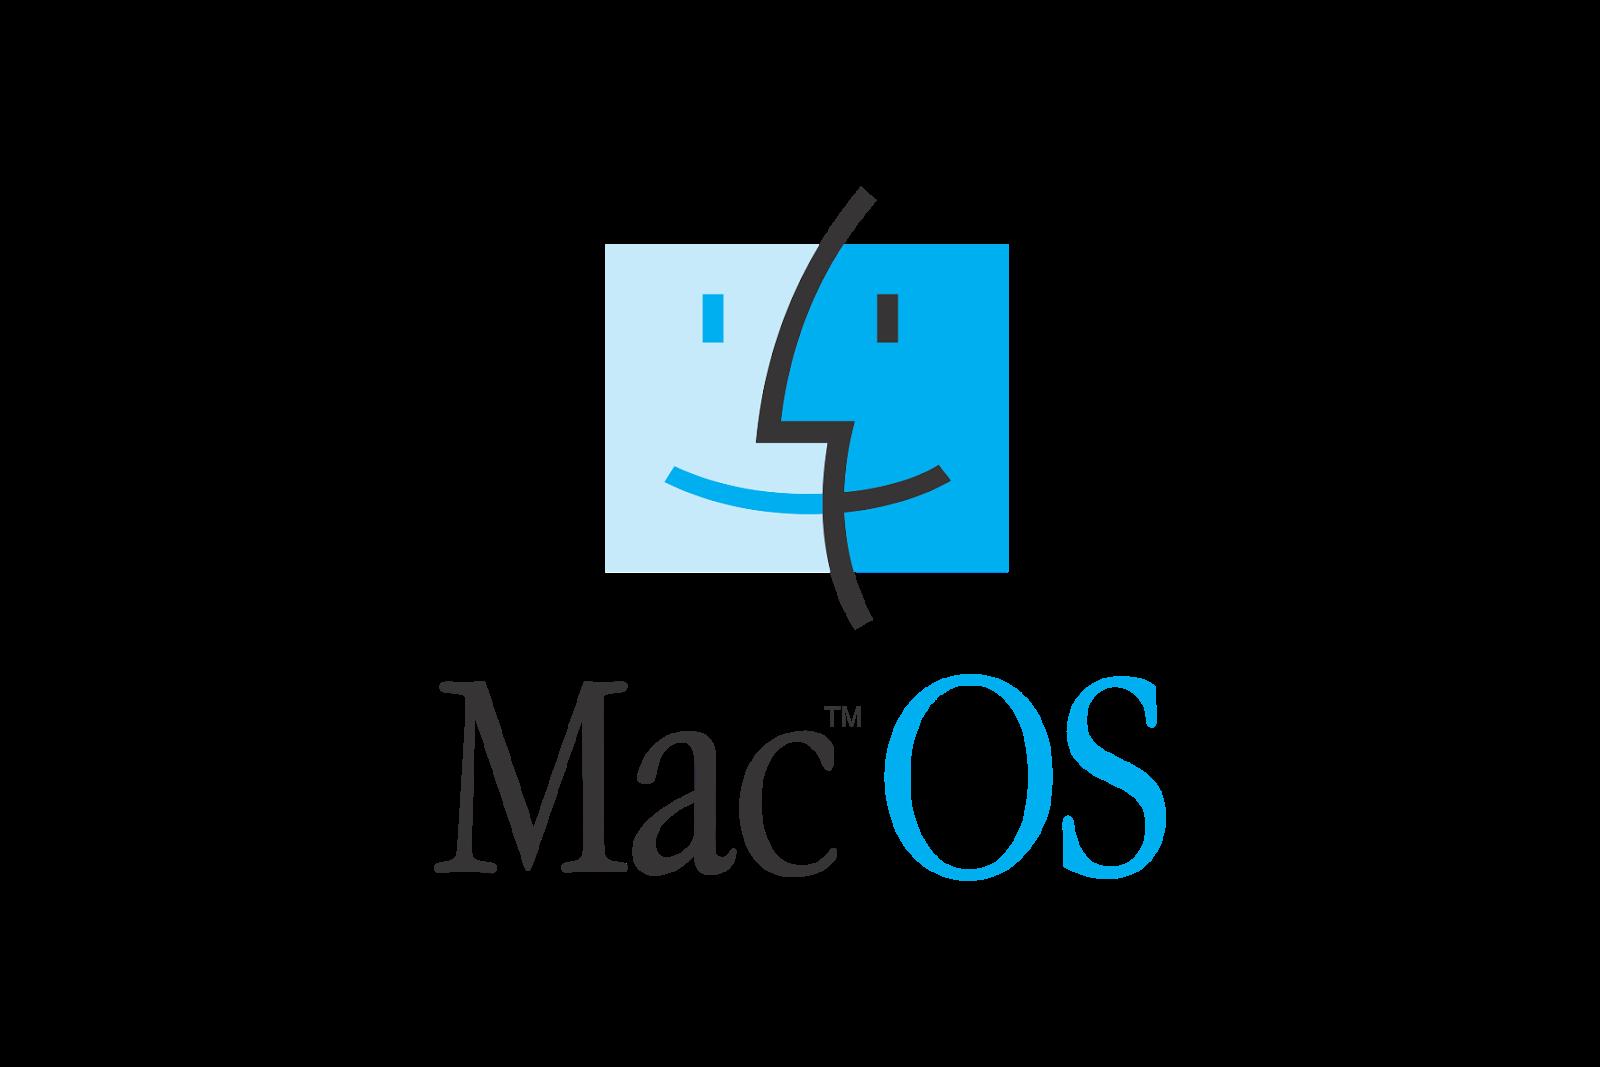 Mac OS Logo Apple computer, Mac os, Mac